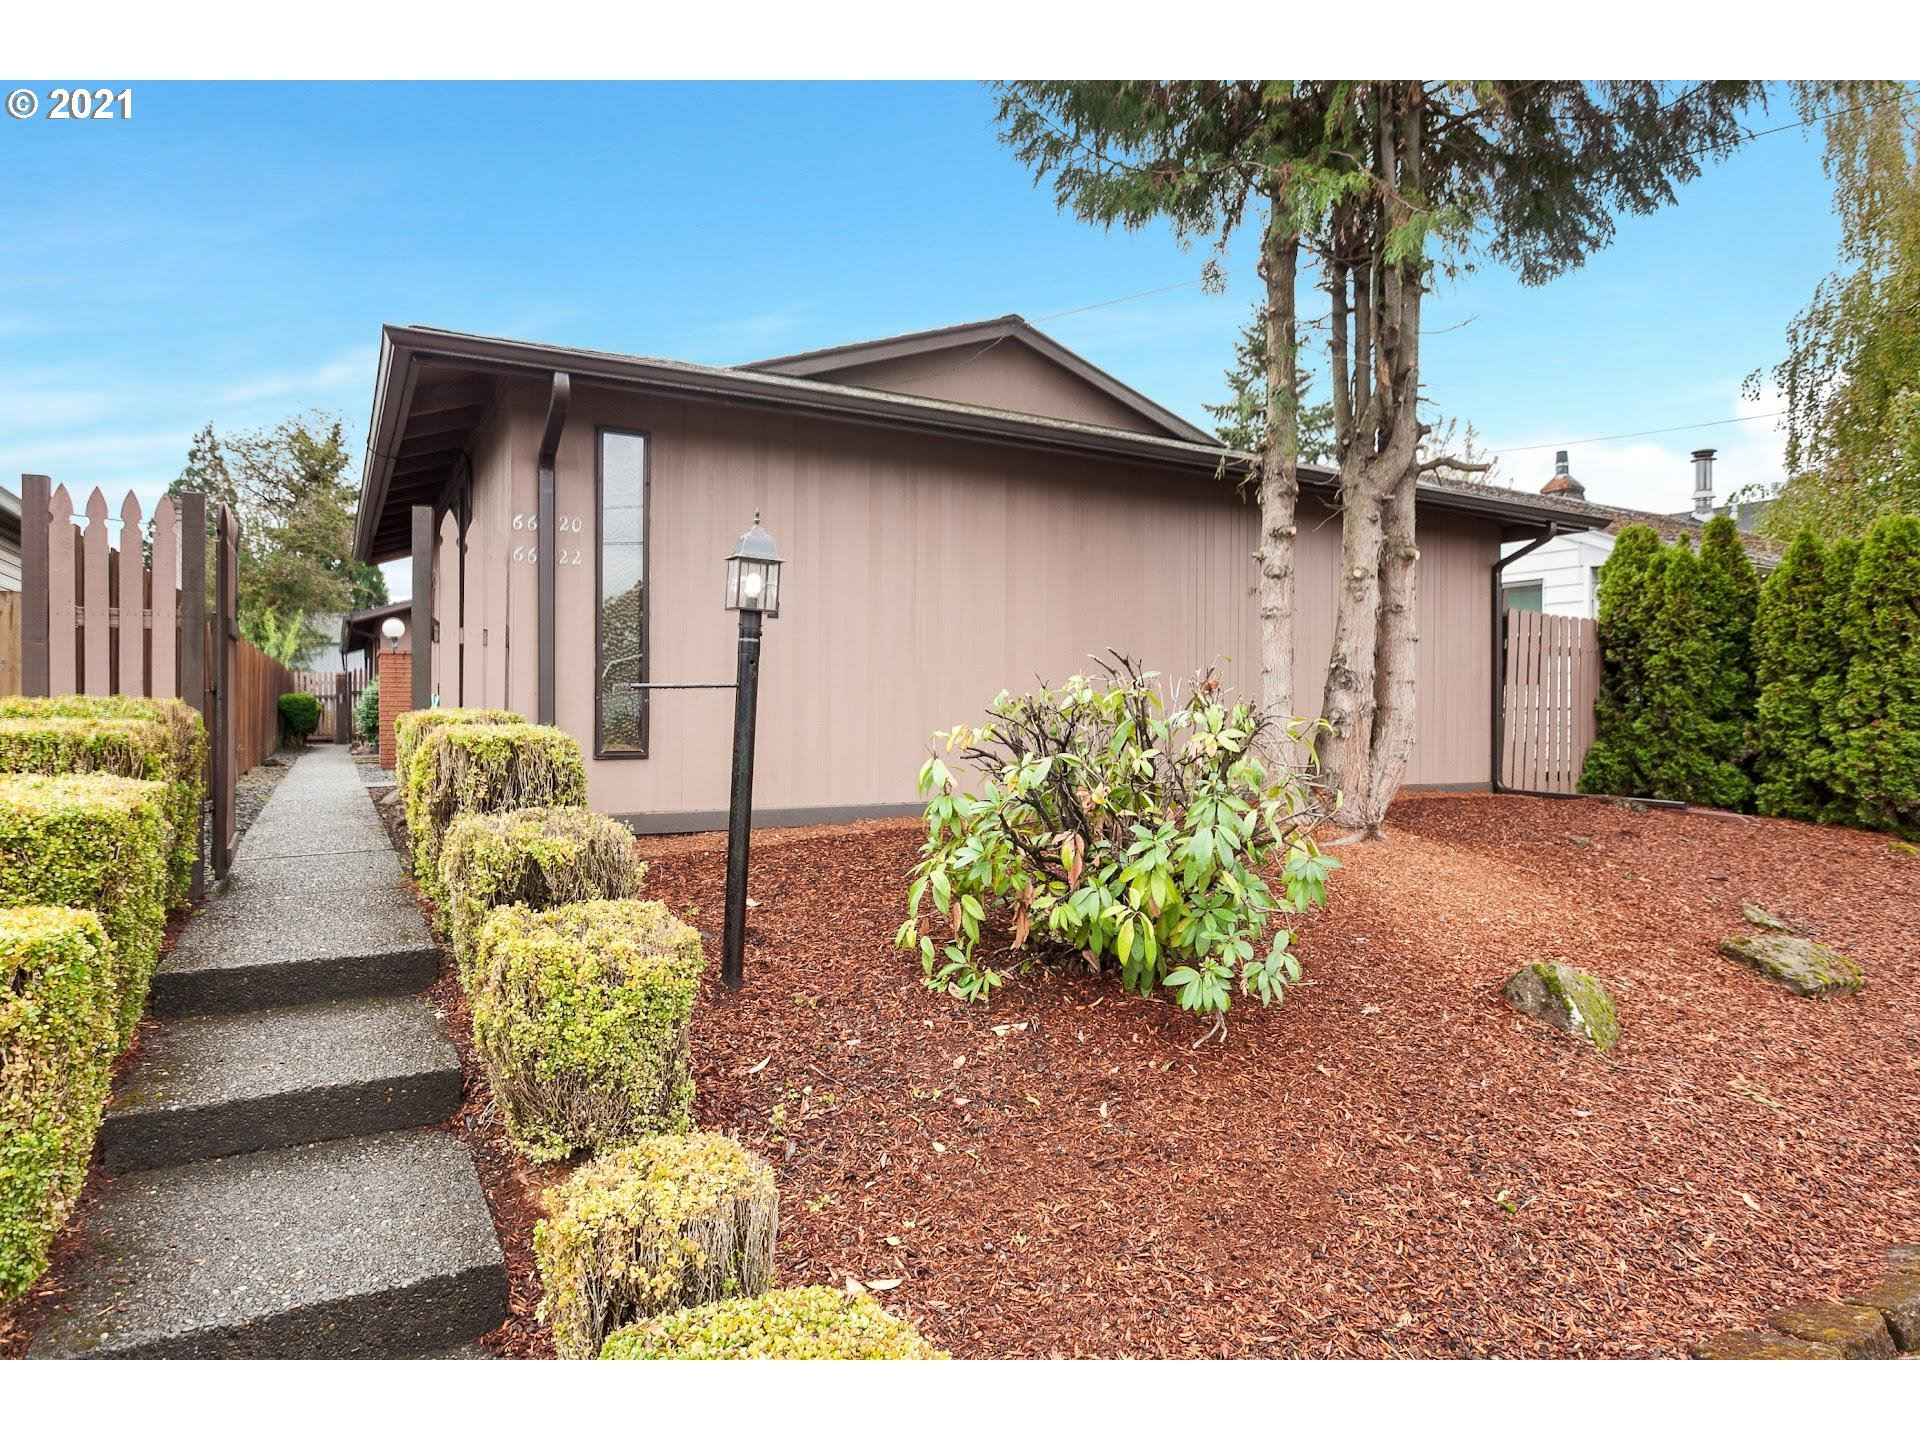 6620 SE WOODSTOCK BLVD, Portland, OR 97206 - MLS#: 21518982